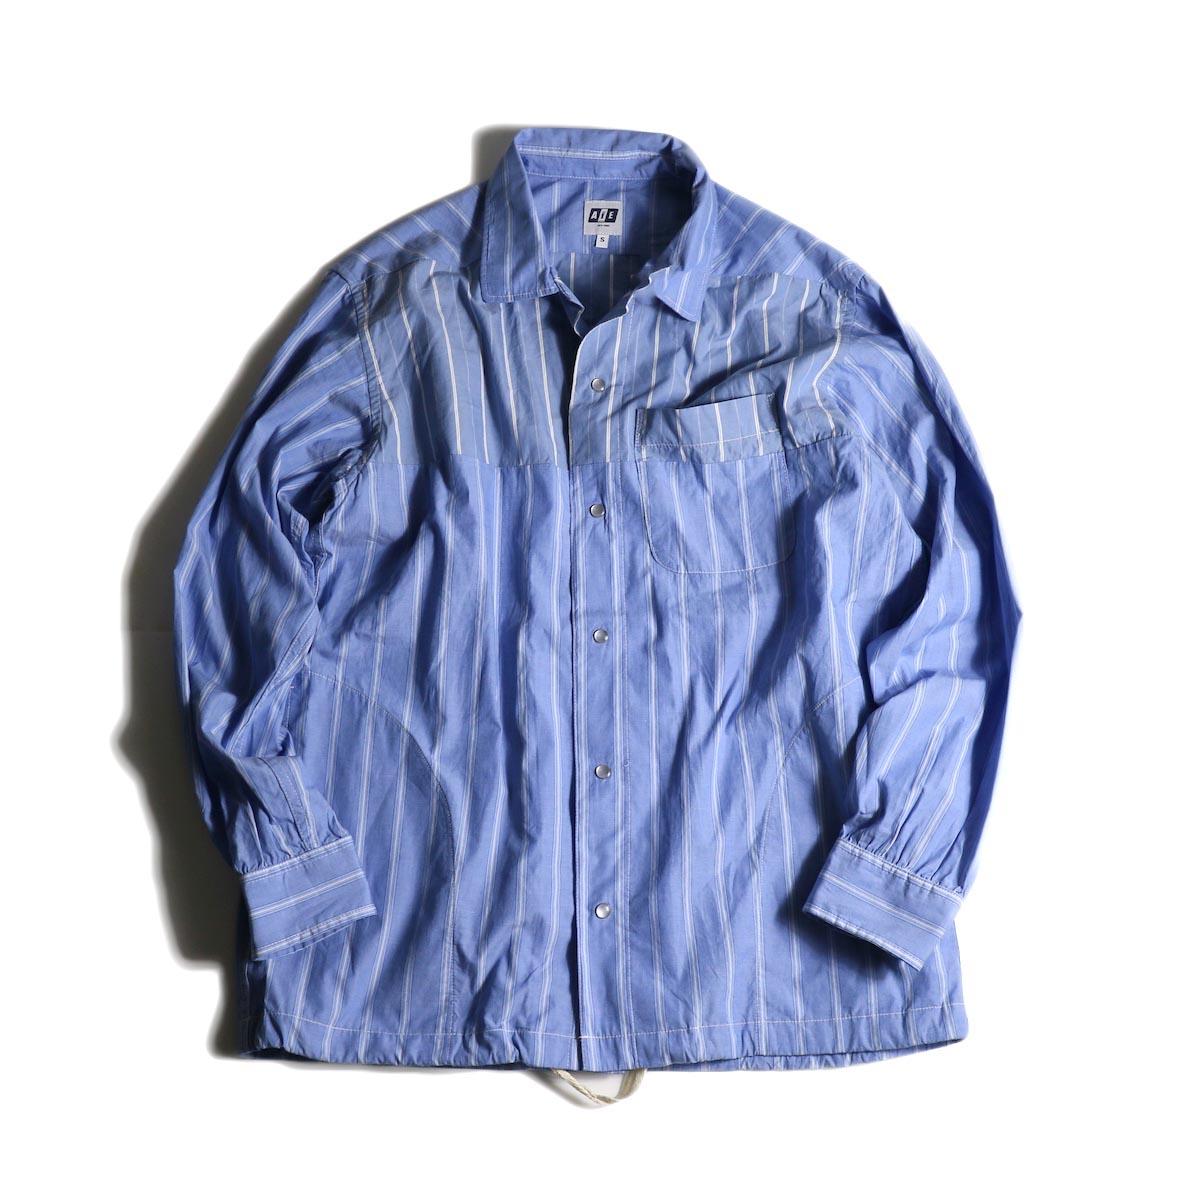 AiE / Coach Shirt -Wide Regent St.